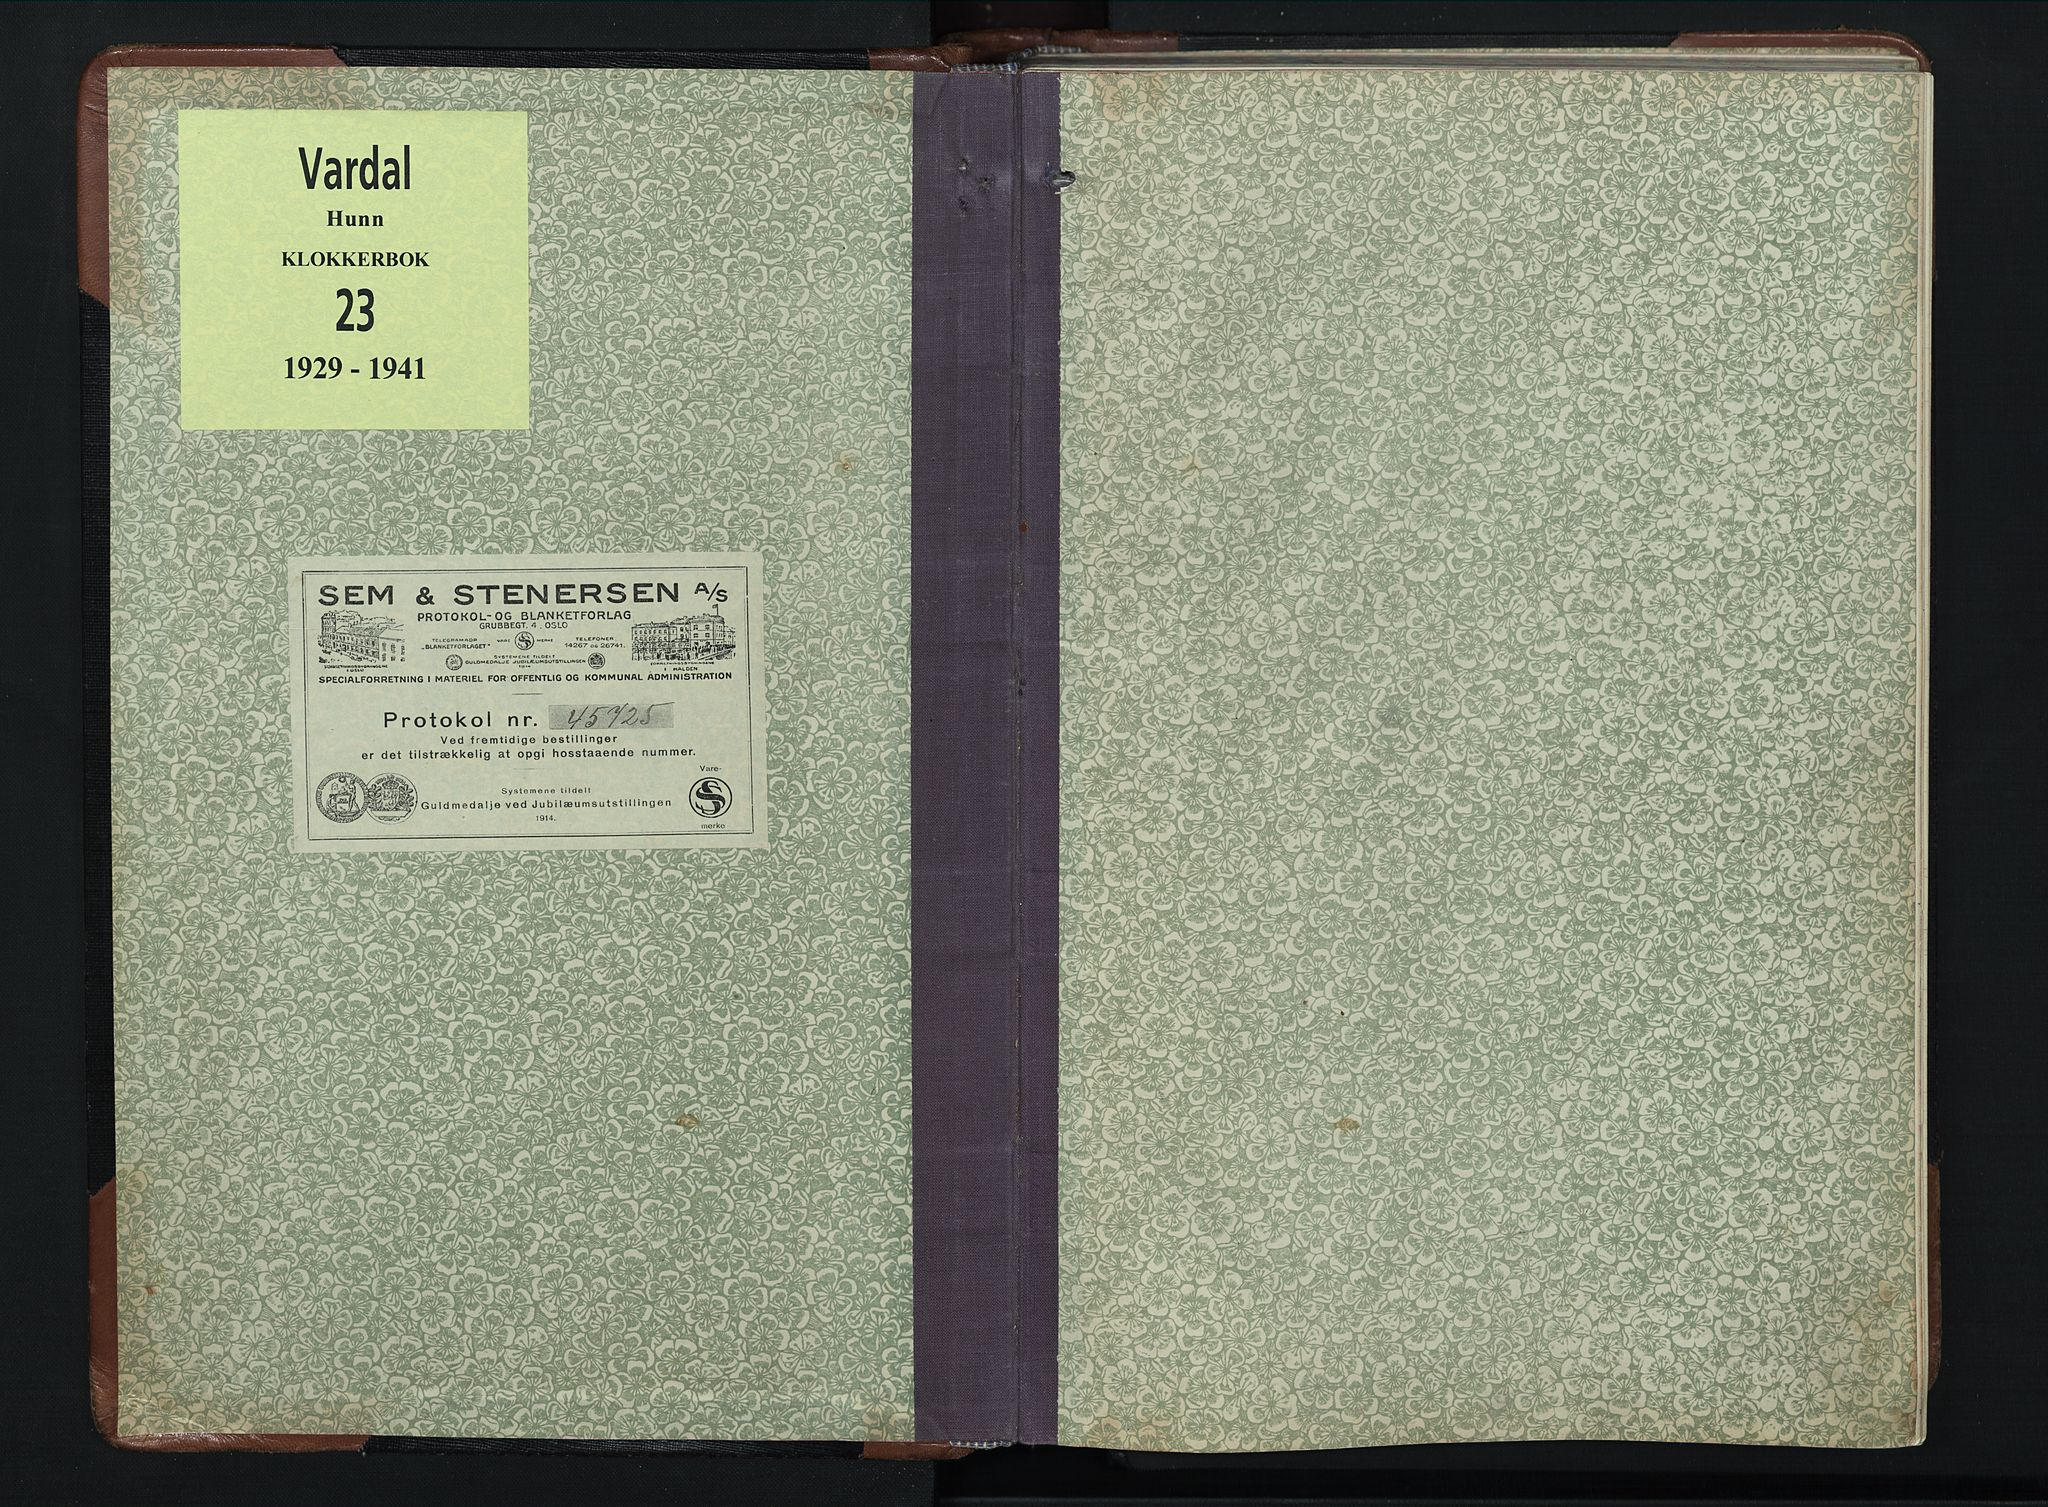 SAH, Vardal prestekontor, H/Ha/Hab/L0023: Klokkerbok nr. 23, 1929-1941